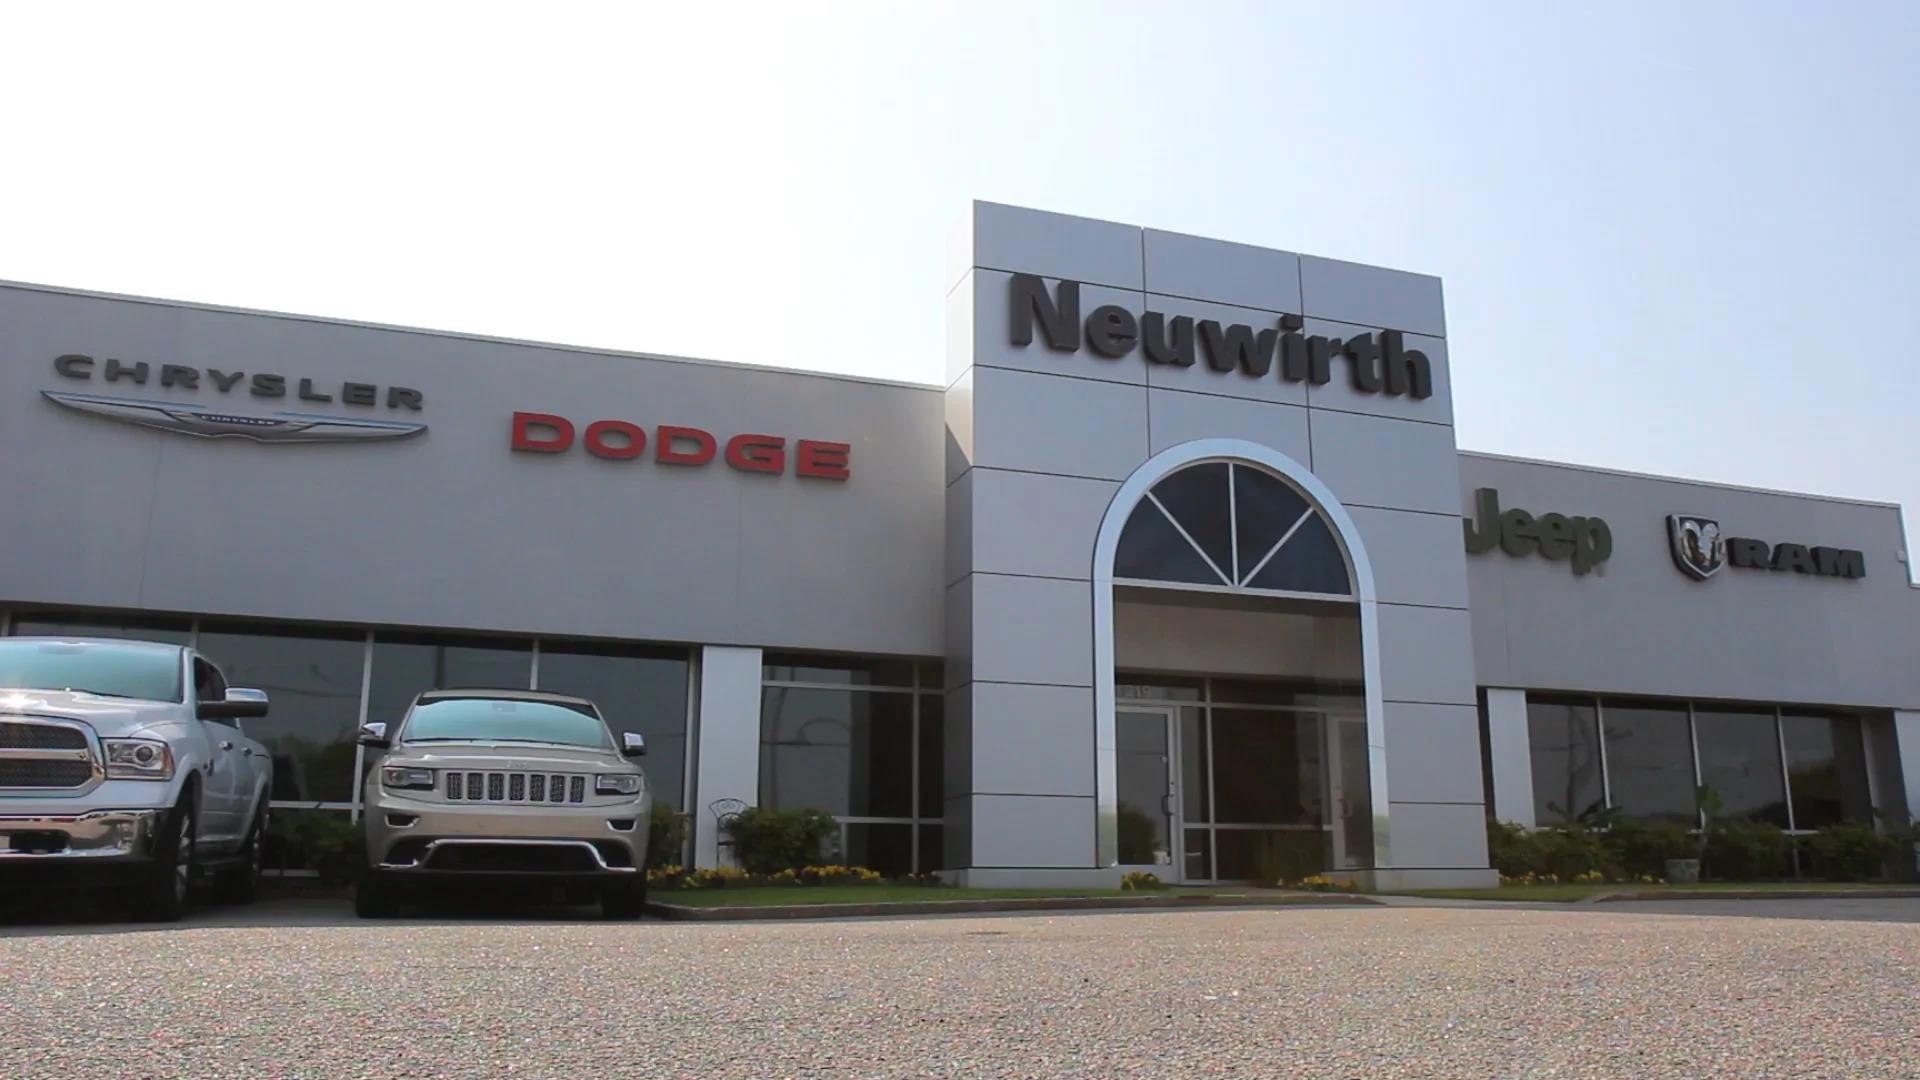 Neuwirth motors in wilmington nc auto dealers yellow for Neuwirth motors inc wilmington nc